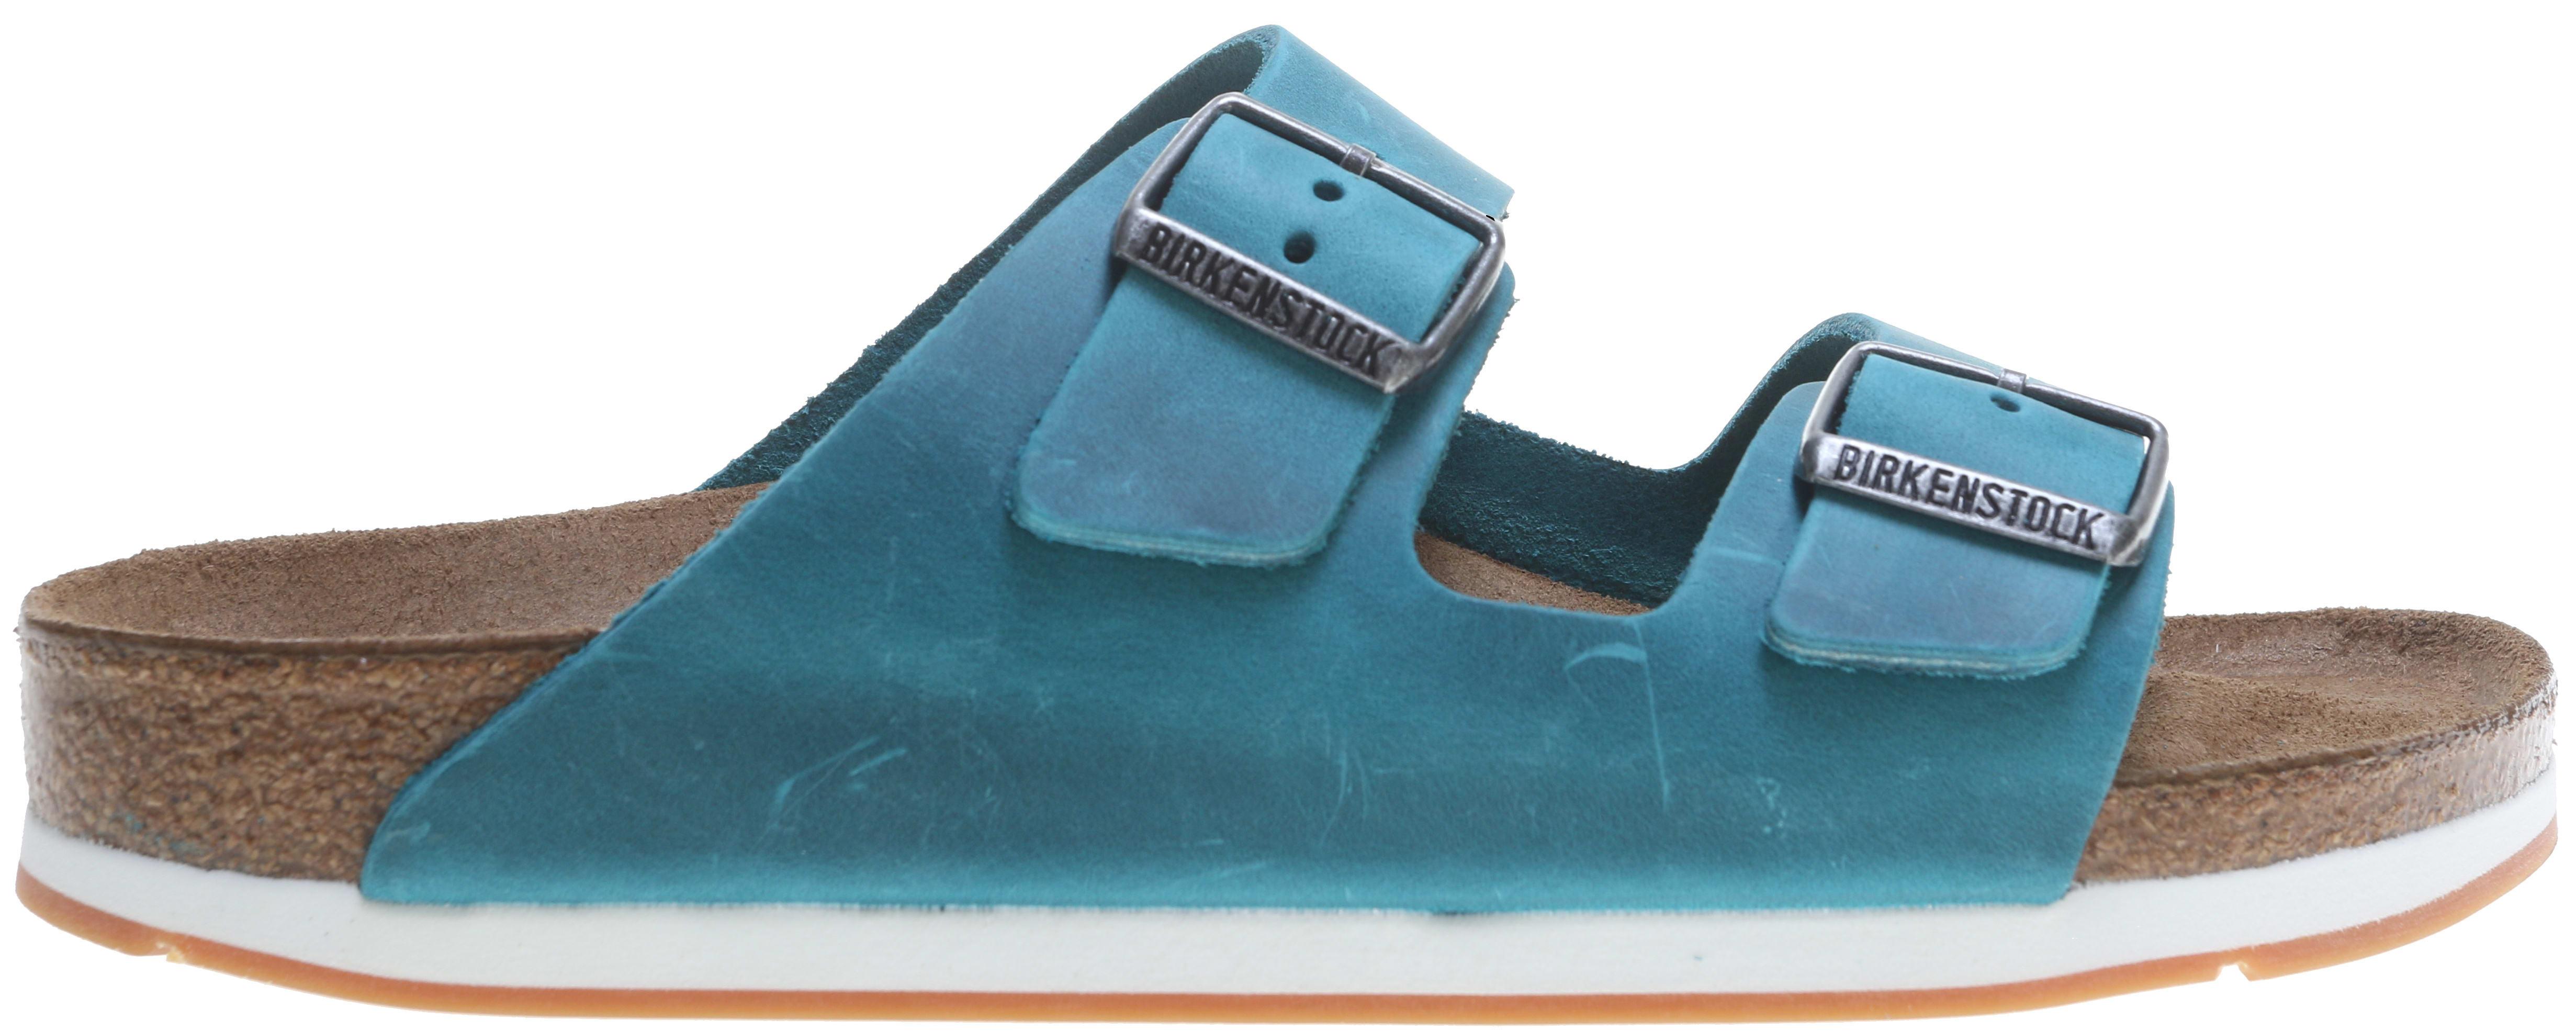 birkenstock arizona sport sandal